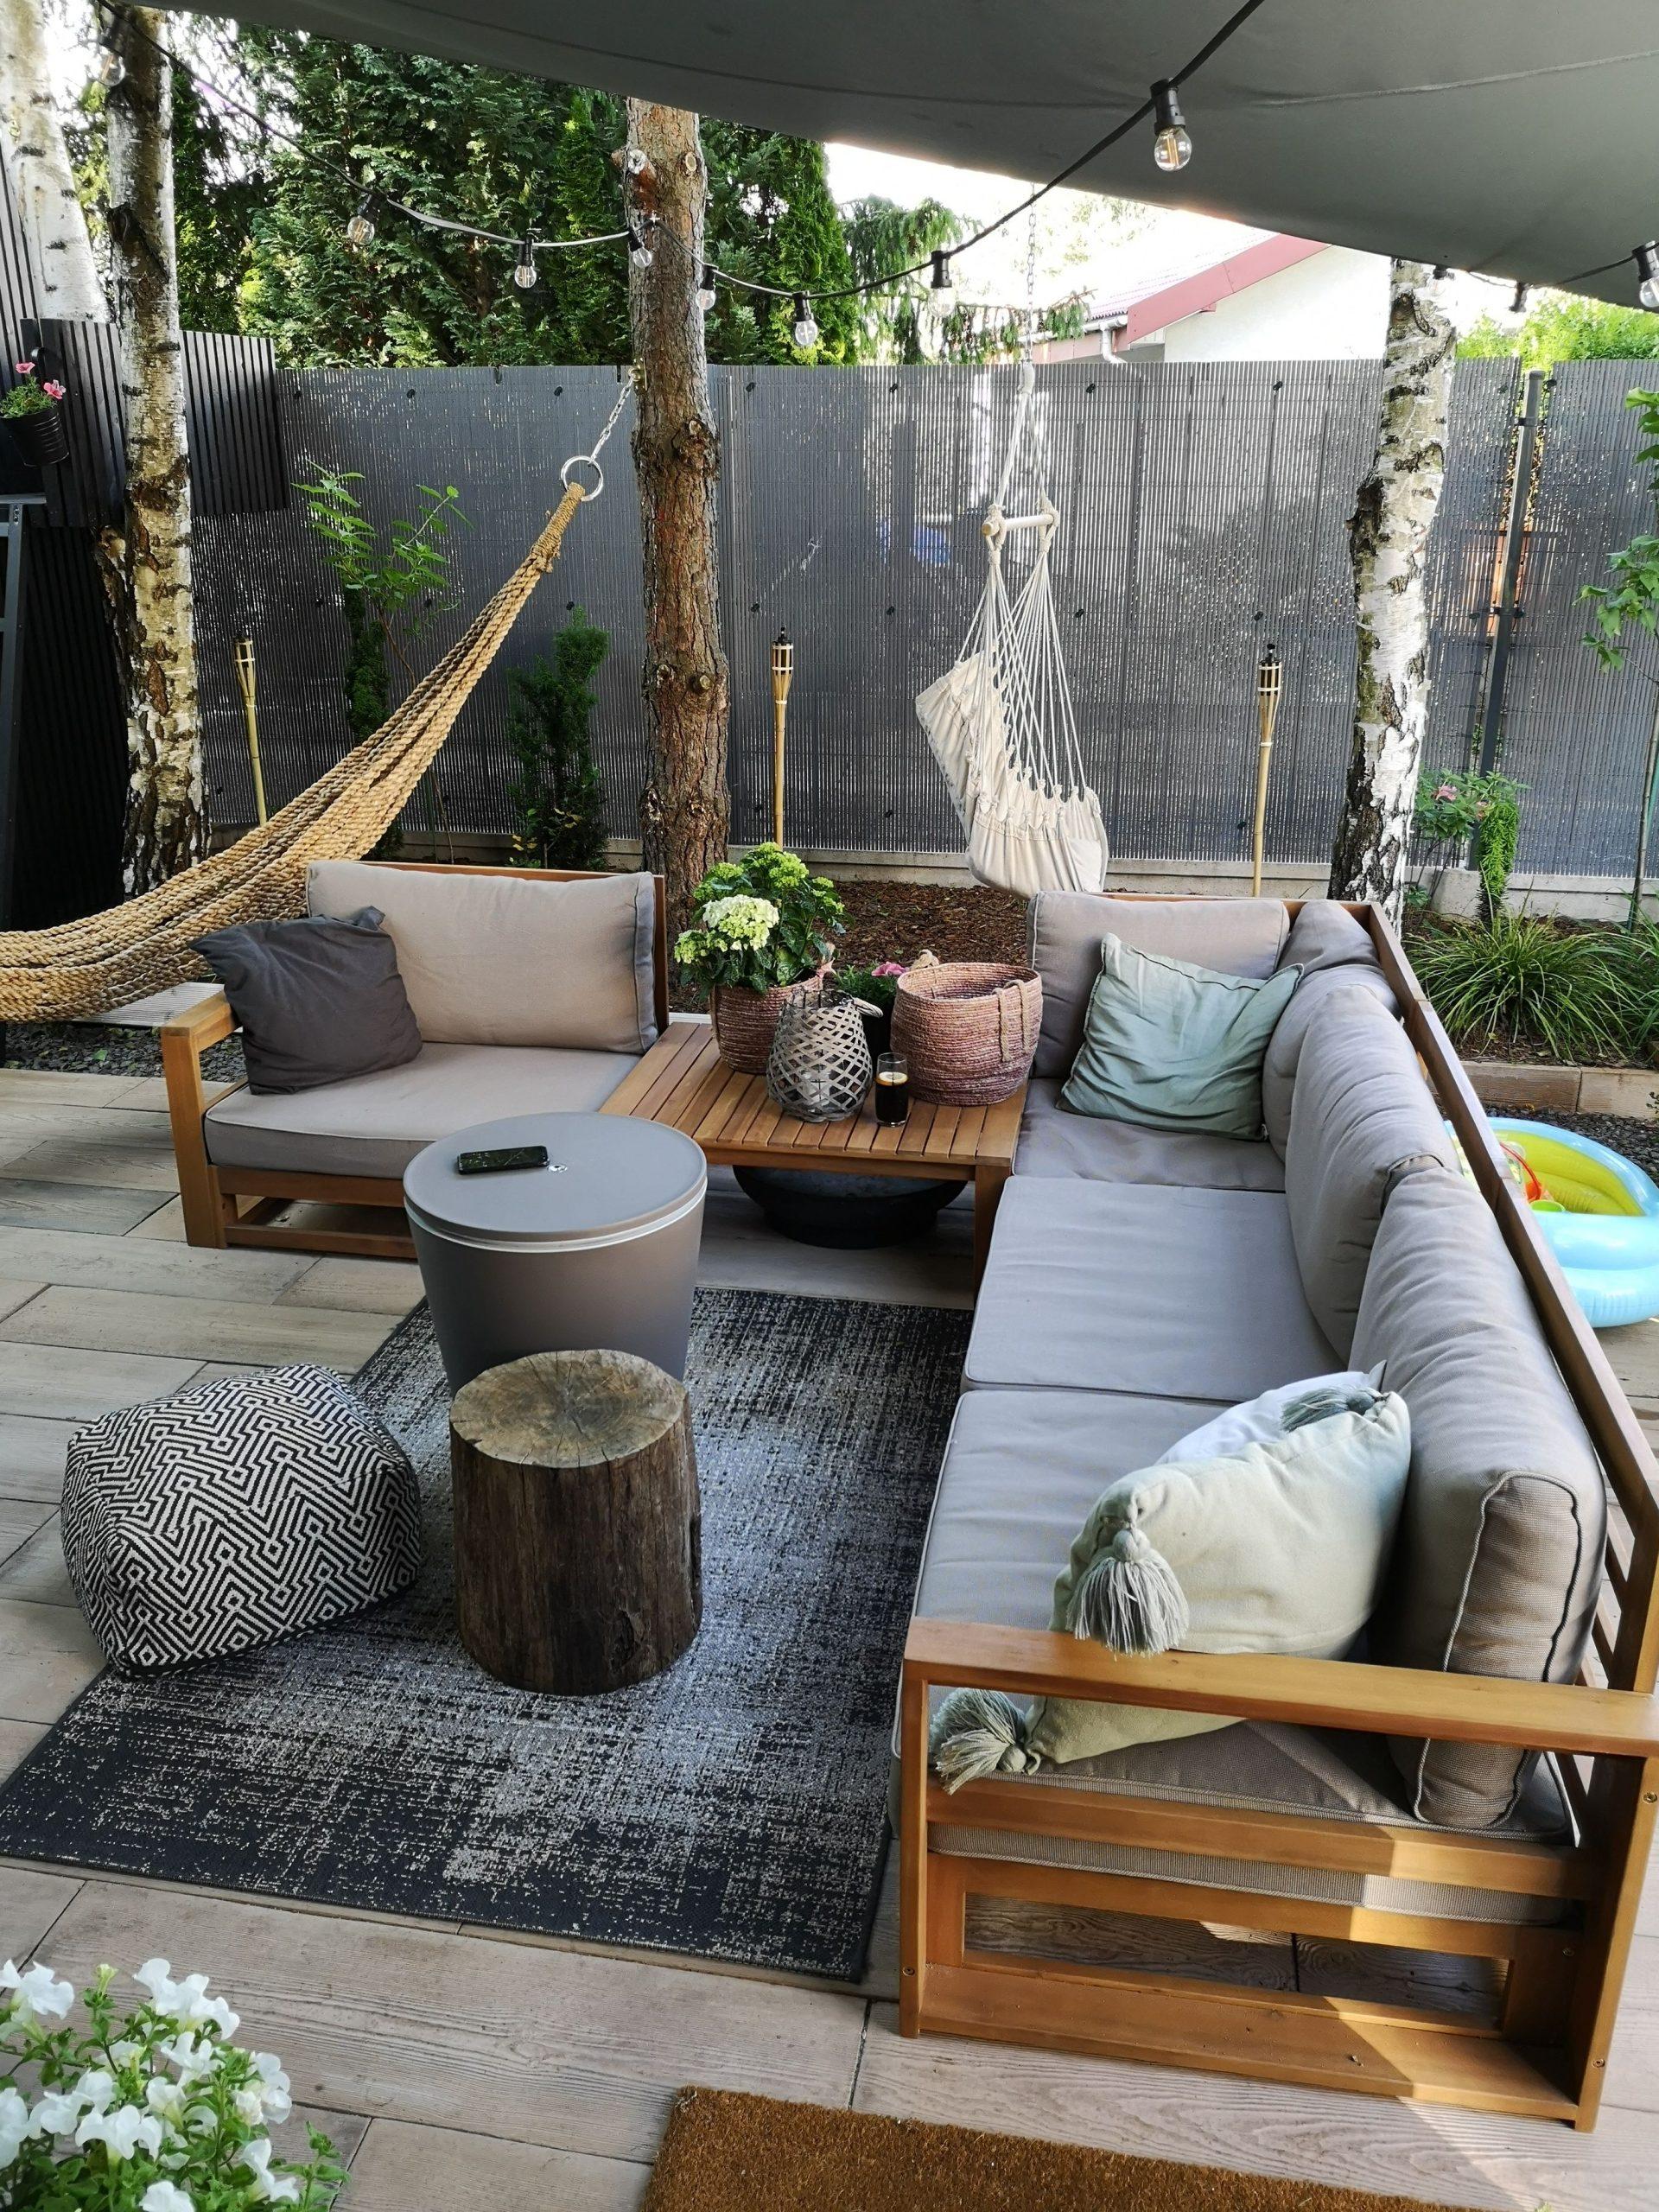 Full Size of Loungeecke Garten Lounge Set Zertifiziertes Holz Braun Timor Kugelleuchten Liegestuhl Ausziehtisch Pavillon Spaten Feuerschale Kinderhaus Spielhaus Möbel Wohnzimmer Loungeecke Garten